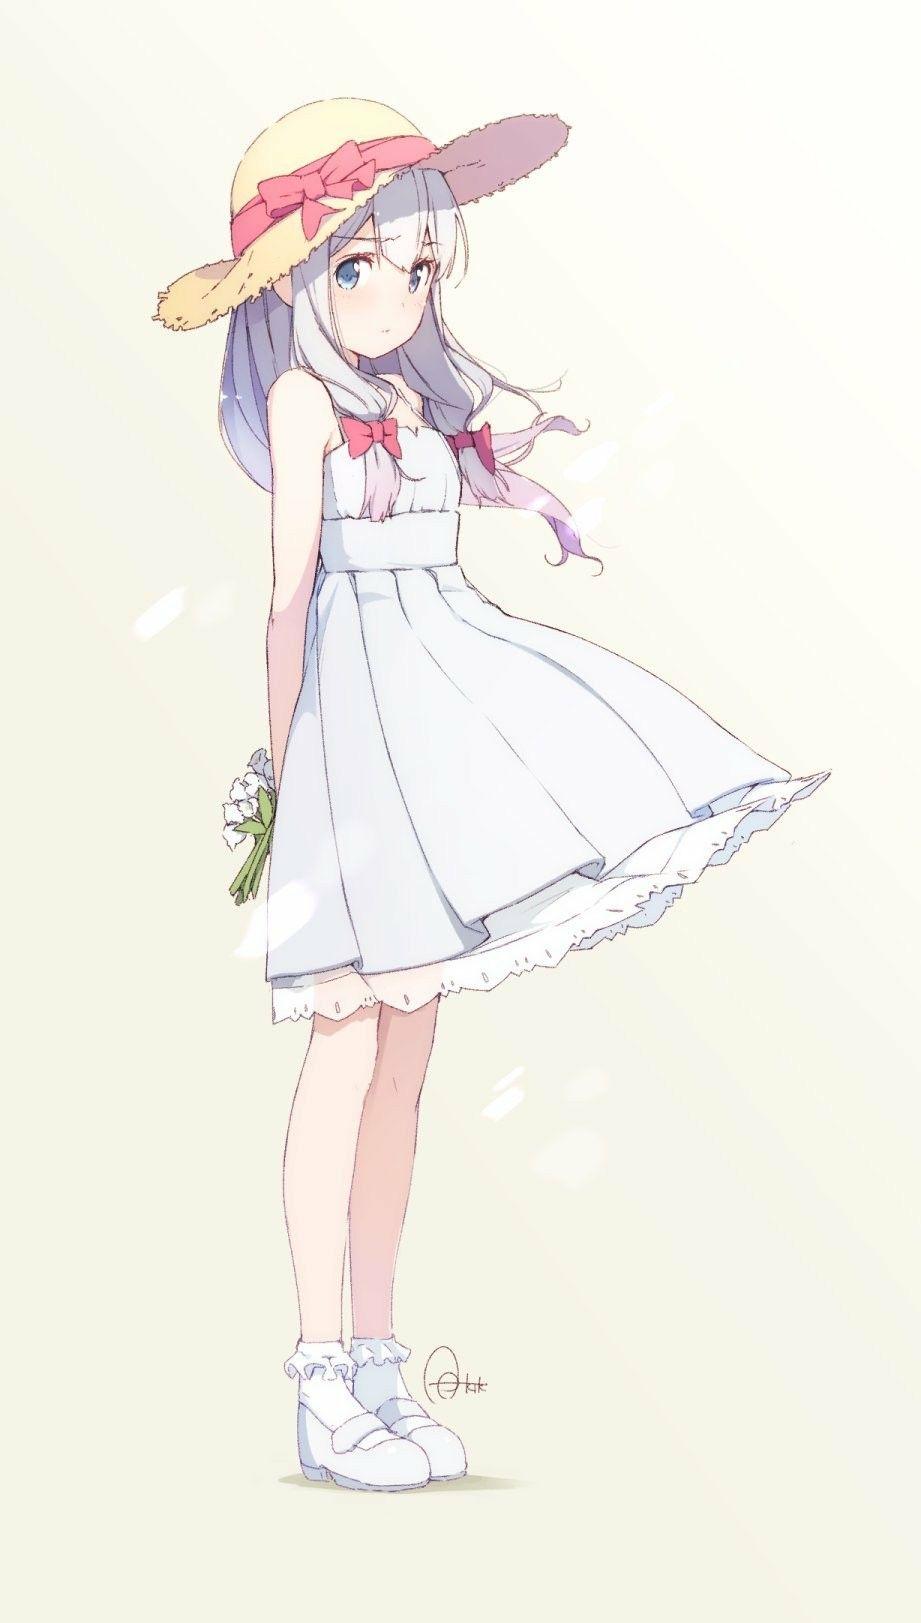 Anime girl cute petite fille manga dessin trop beau creation graphique personnage manga